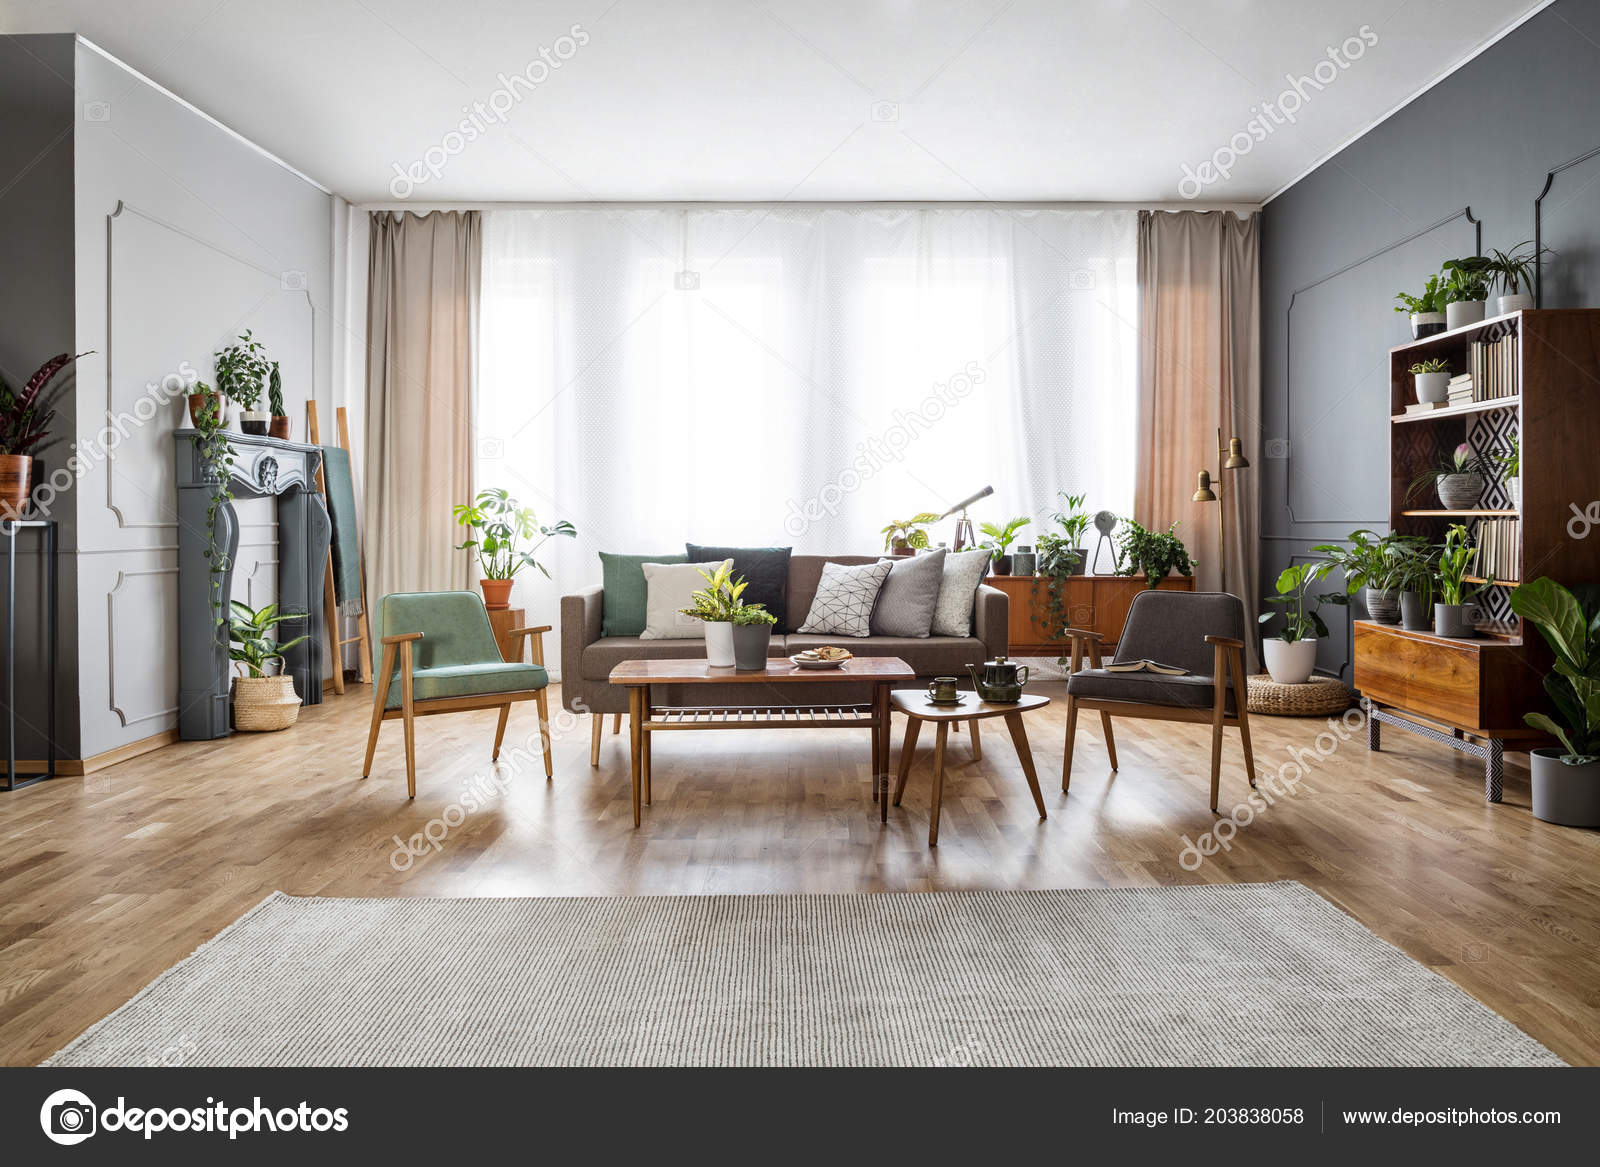 Real Photo Spacious Vintage Living Room Interior Sofa Two ...